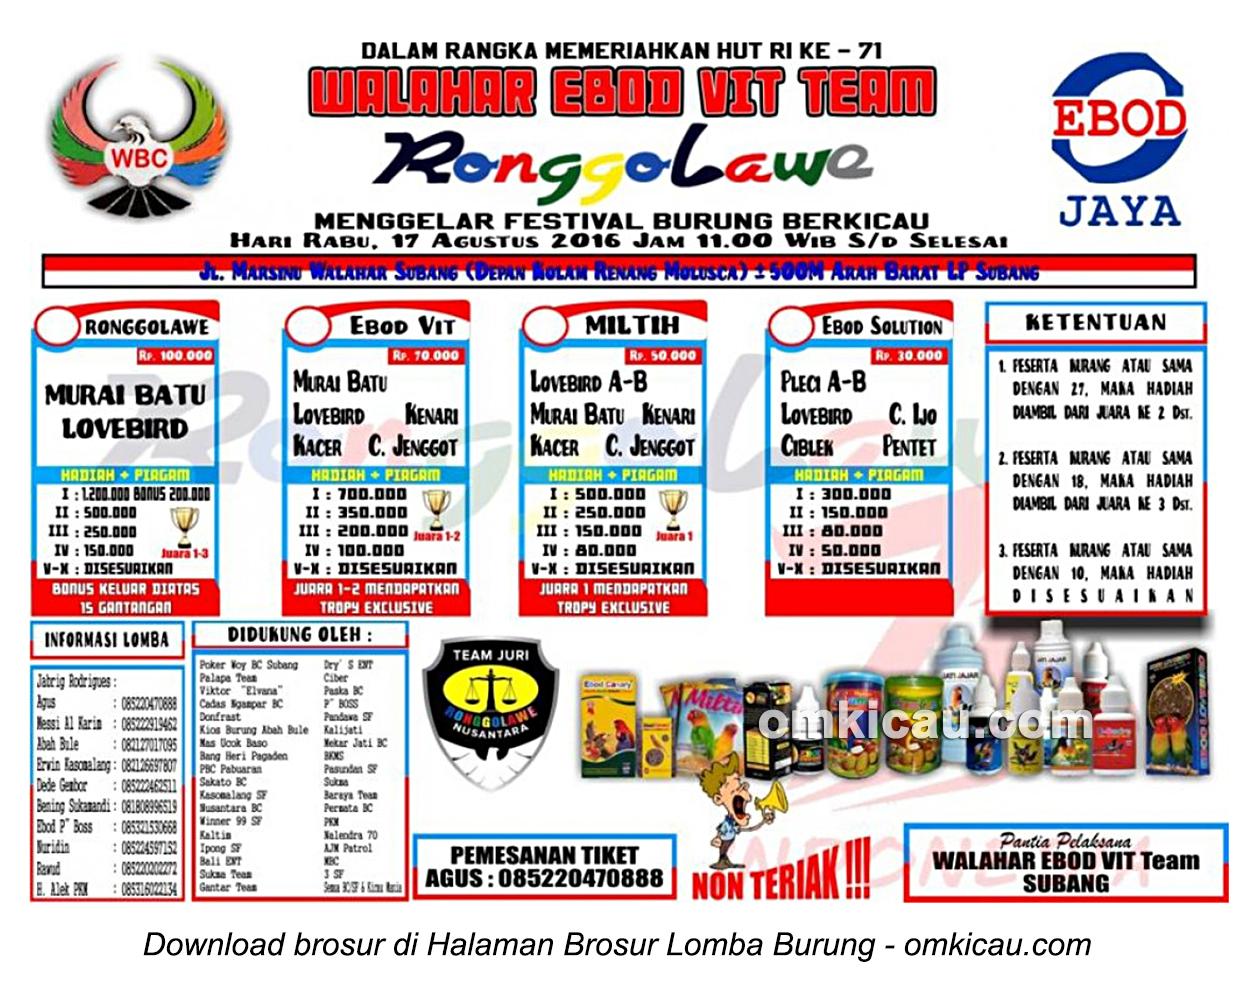 Brosur Lomba Burung Berkicau Walahar Ebod Vit Team, Subang, 17 Agustus 2016